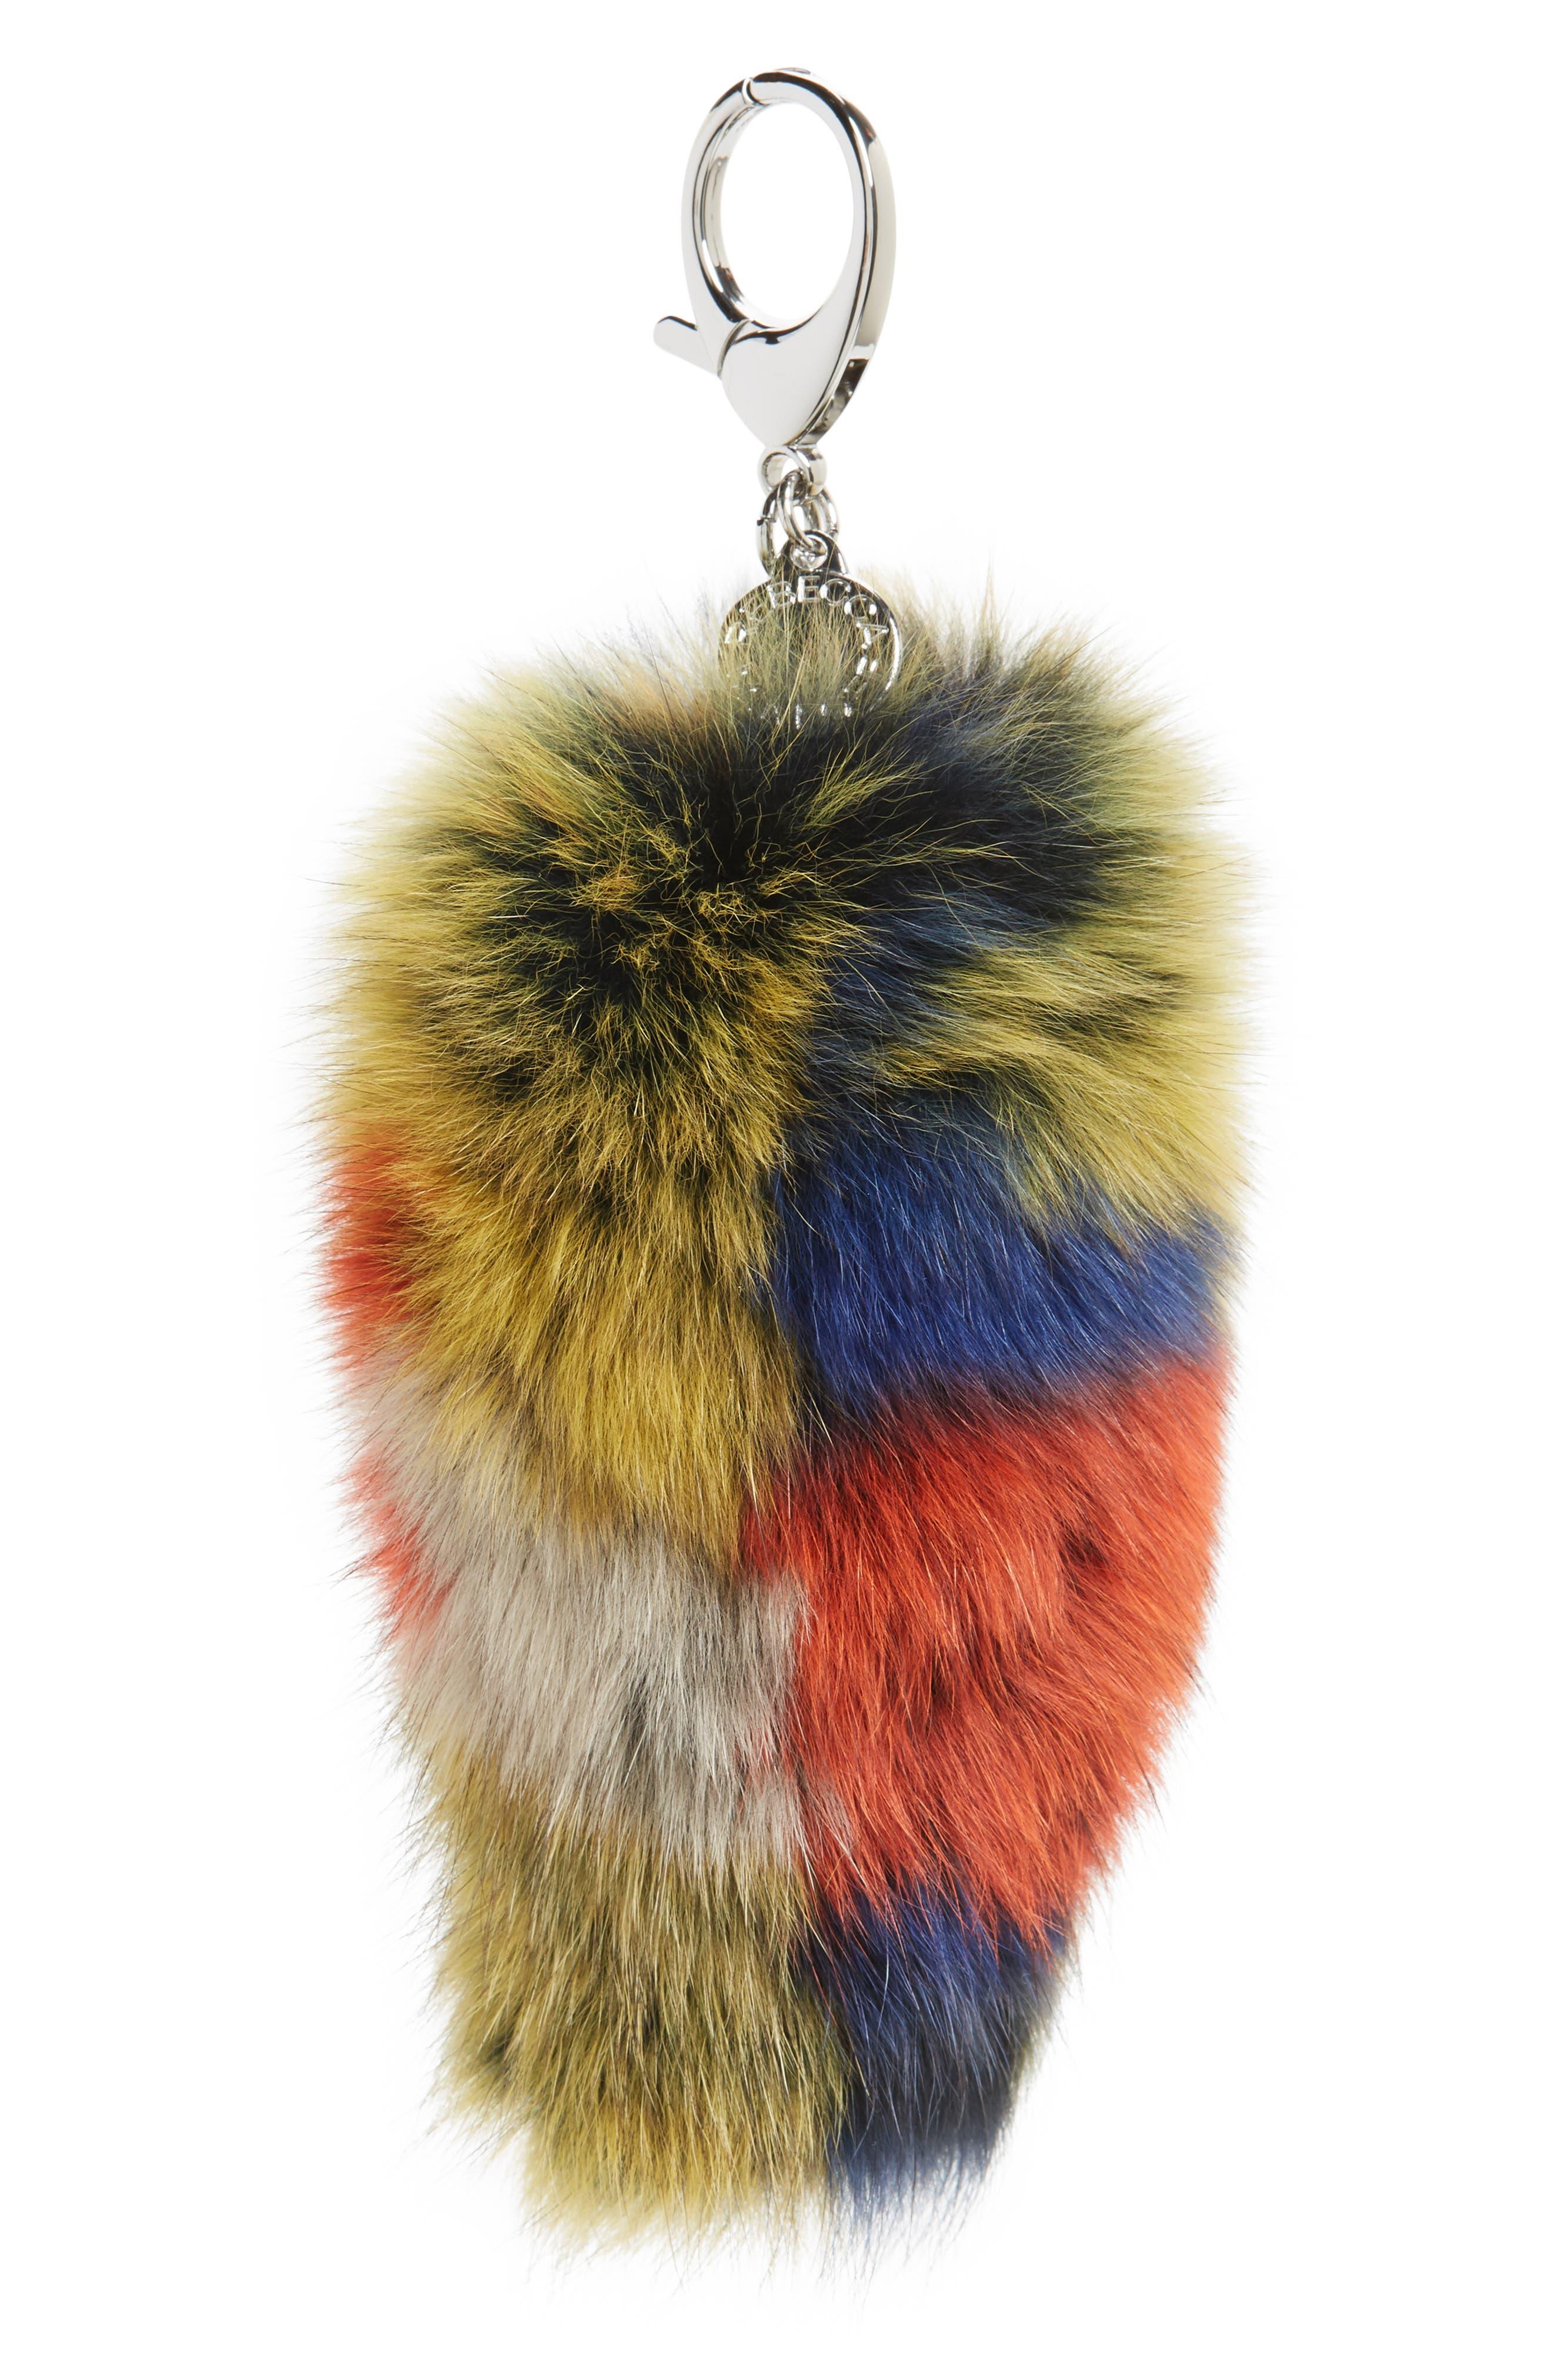 Main Image - Rebecca Minkoff Genuine Fox Fur Bag Charm